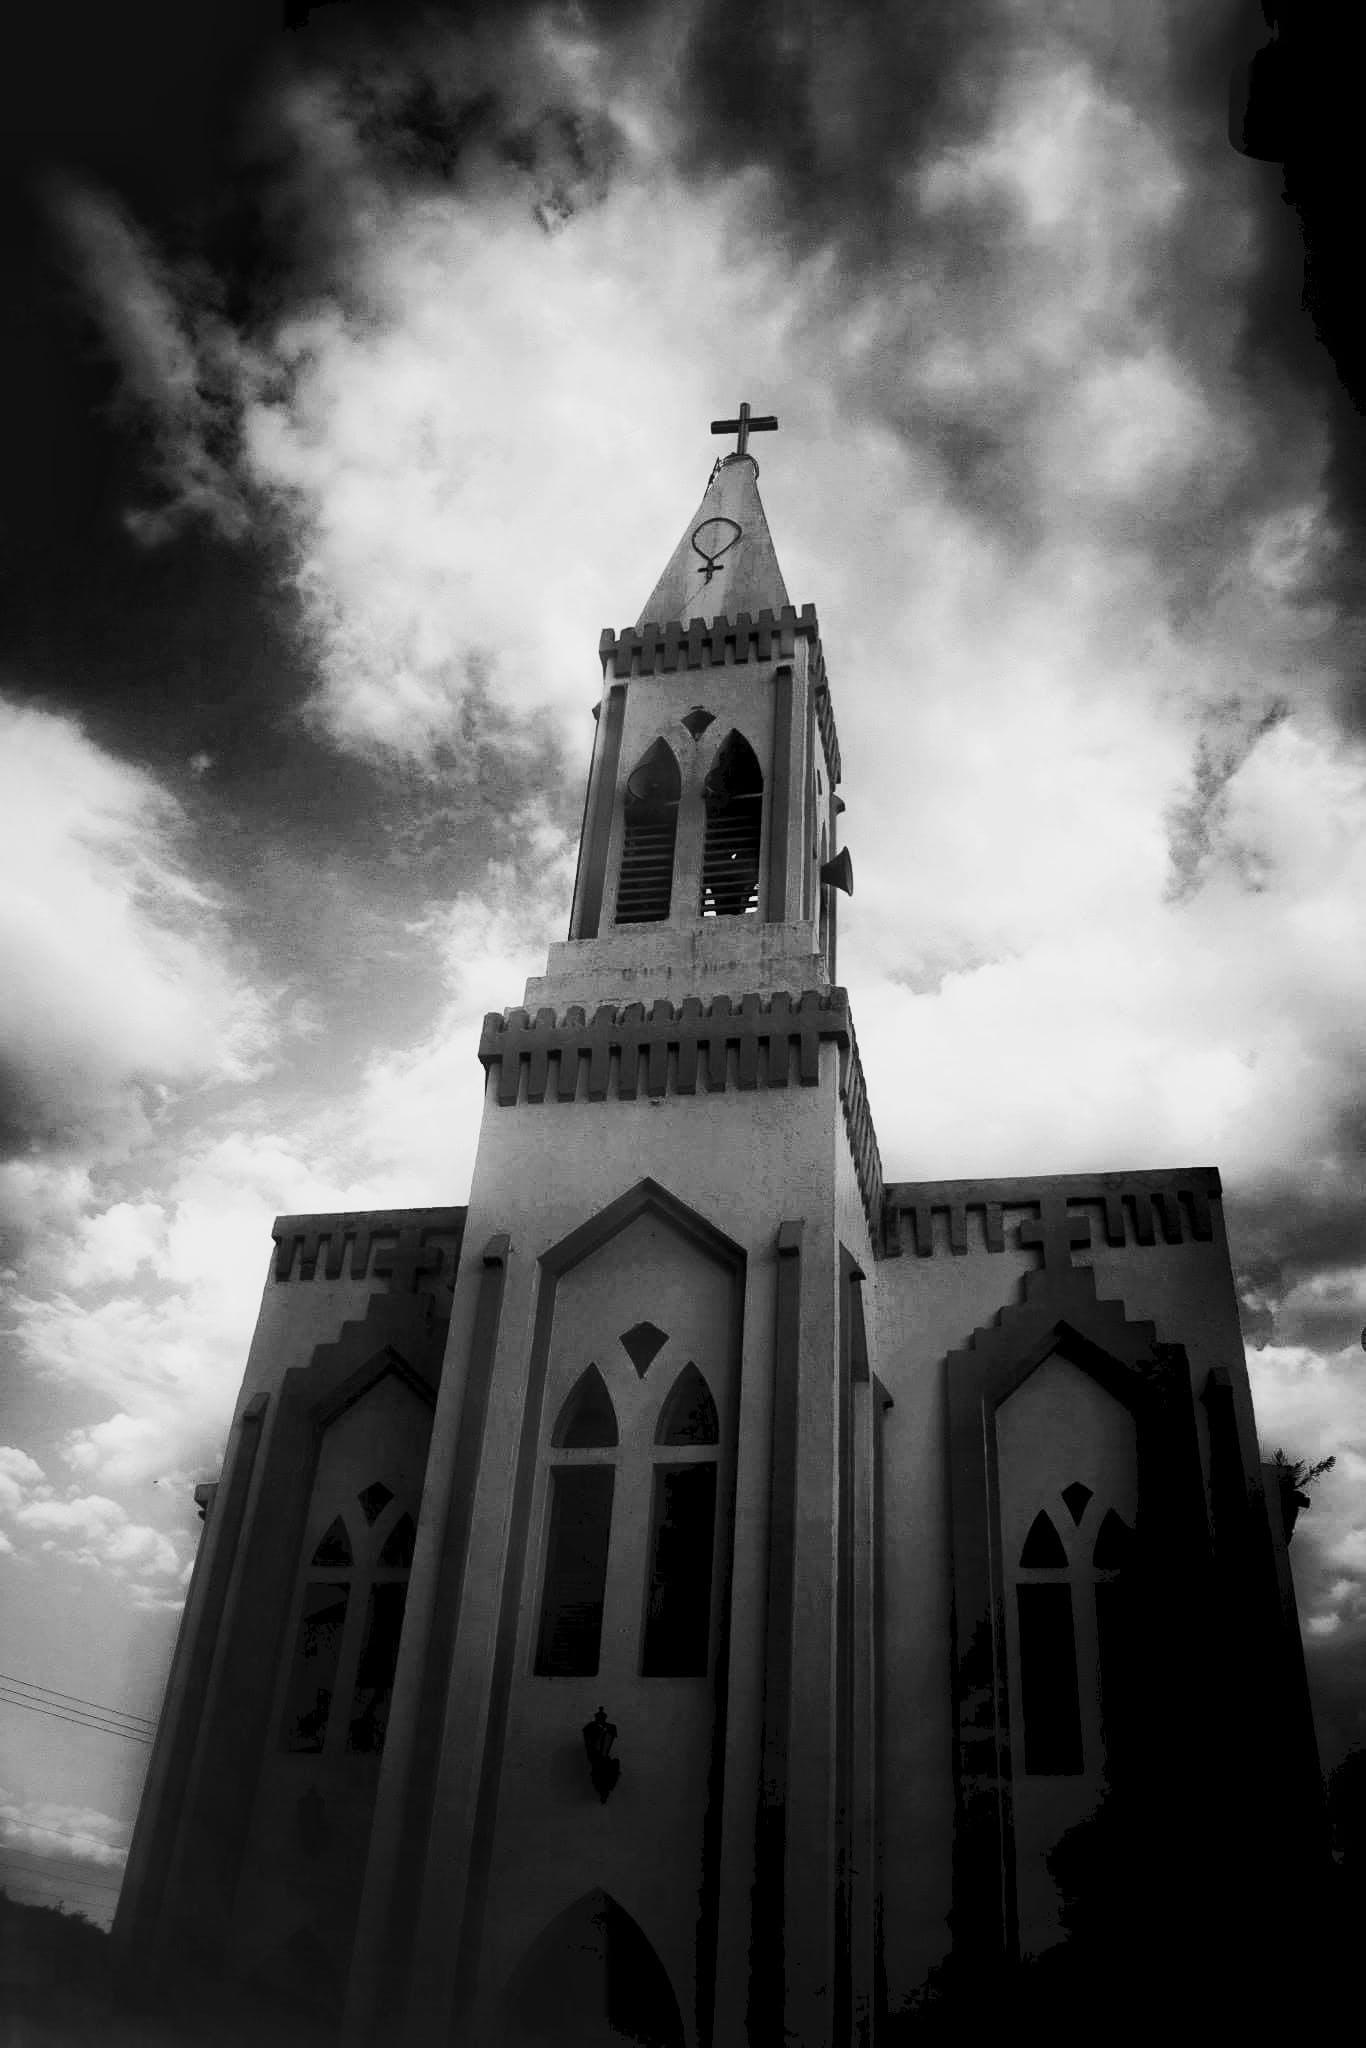 Free stock photo of church, church building, church tower